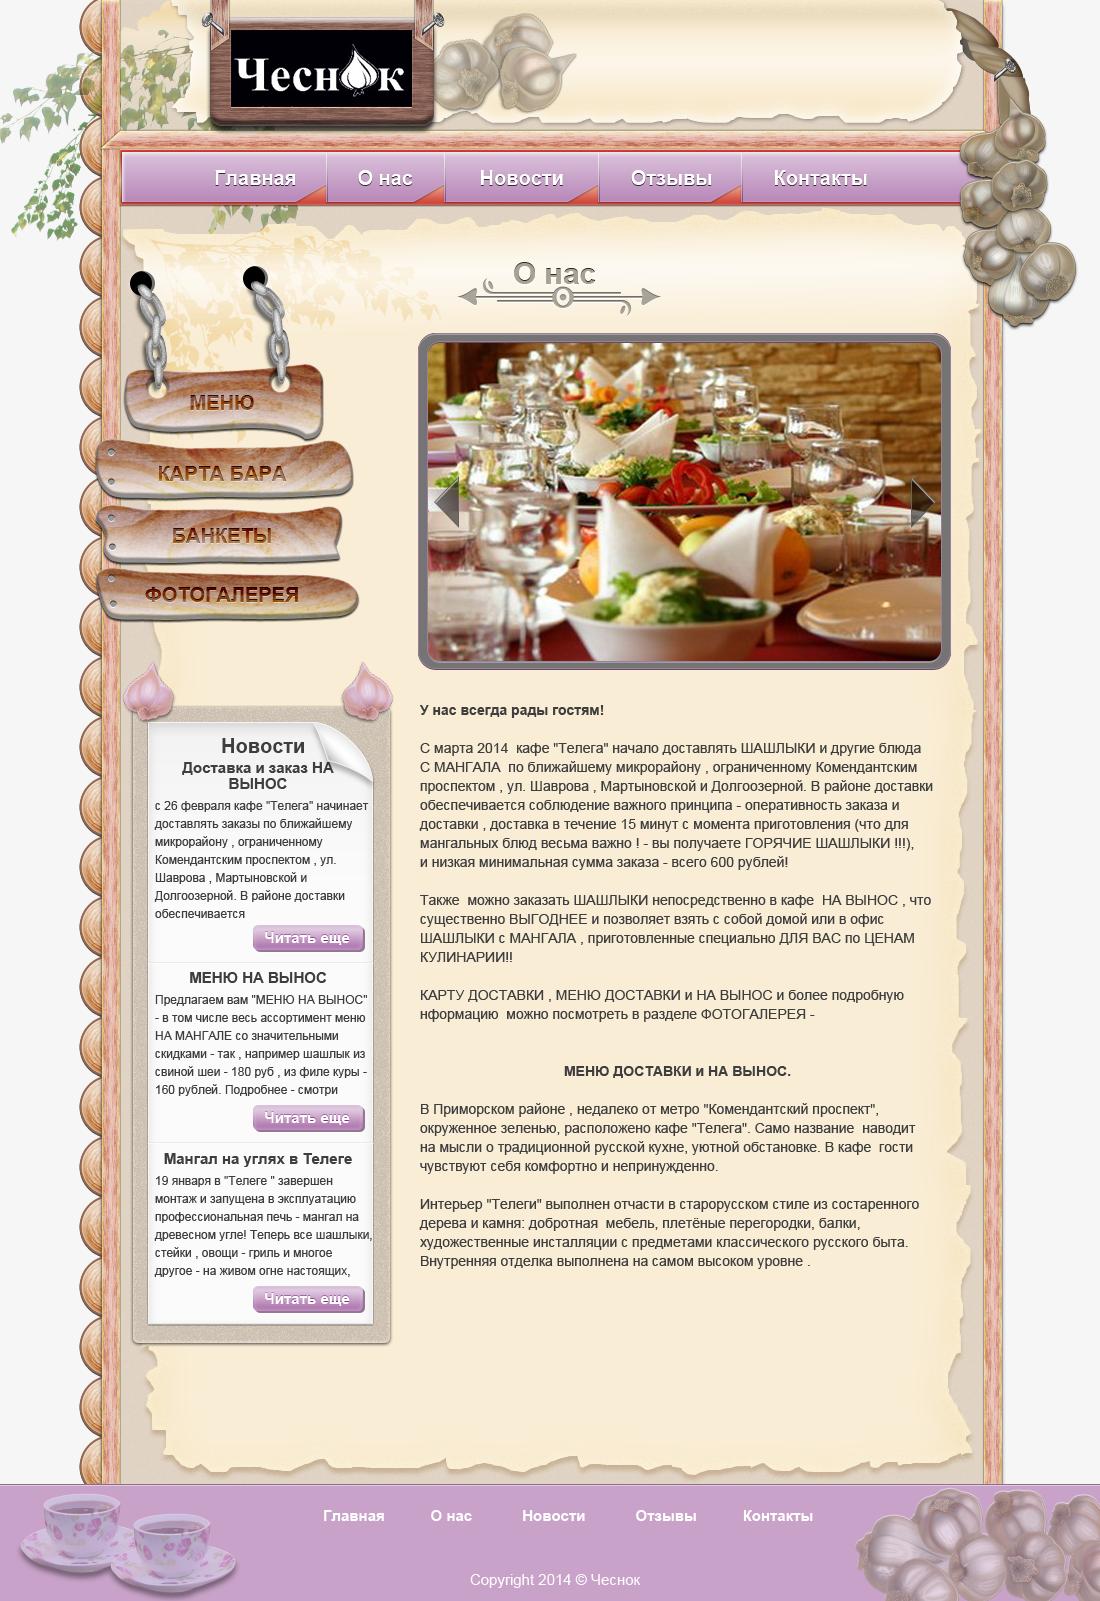 Дизайн сайта. Кафе чеснок